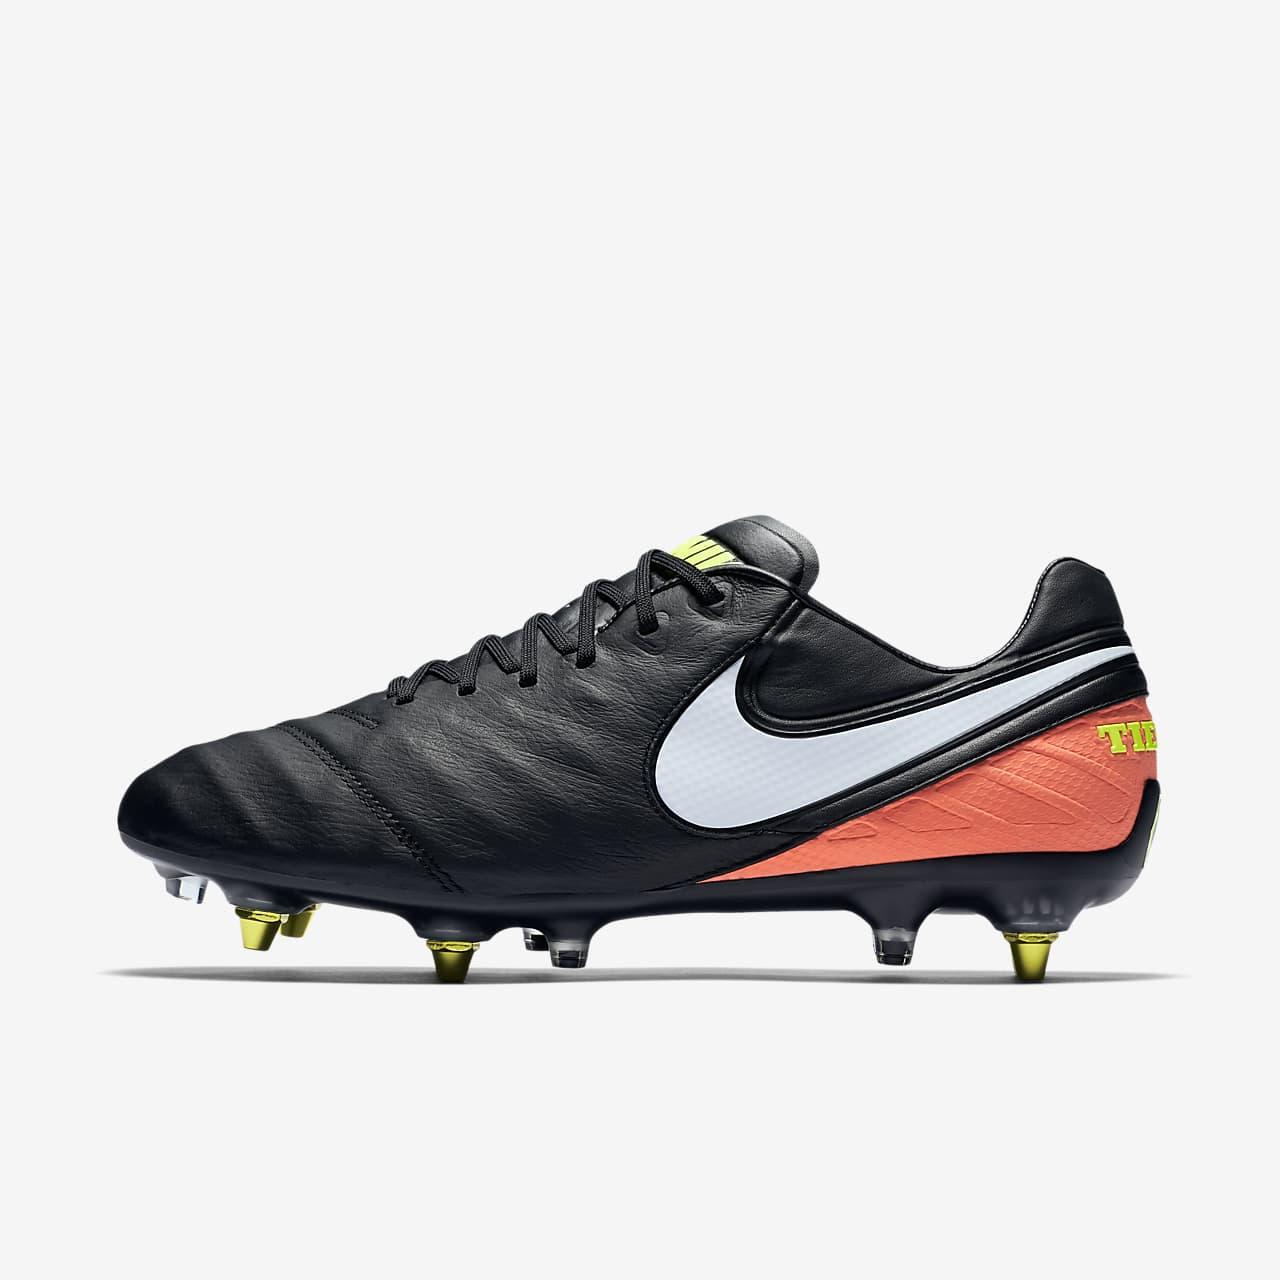 Nike Tiempo Legend VI SG-PRO Anti Clog Traction Soft-Ground Football Boot